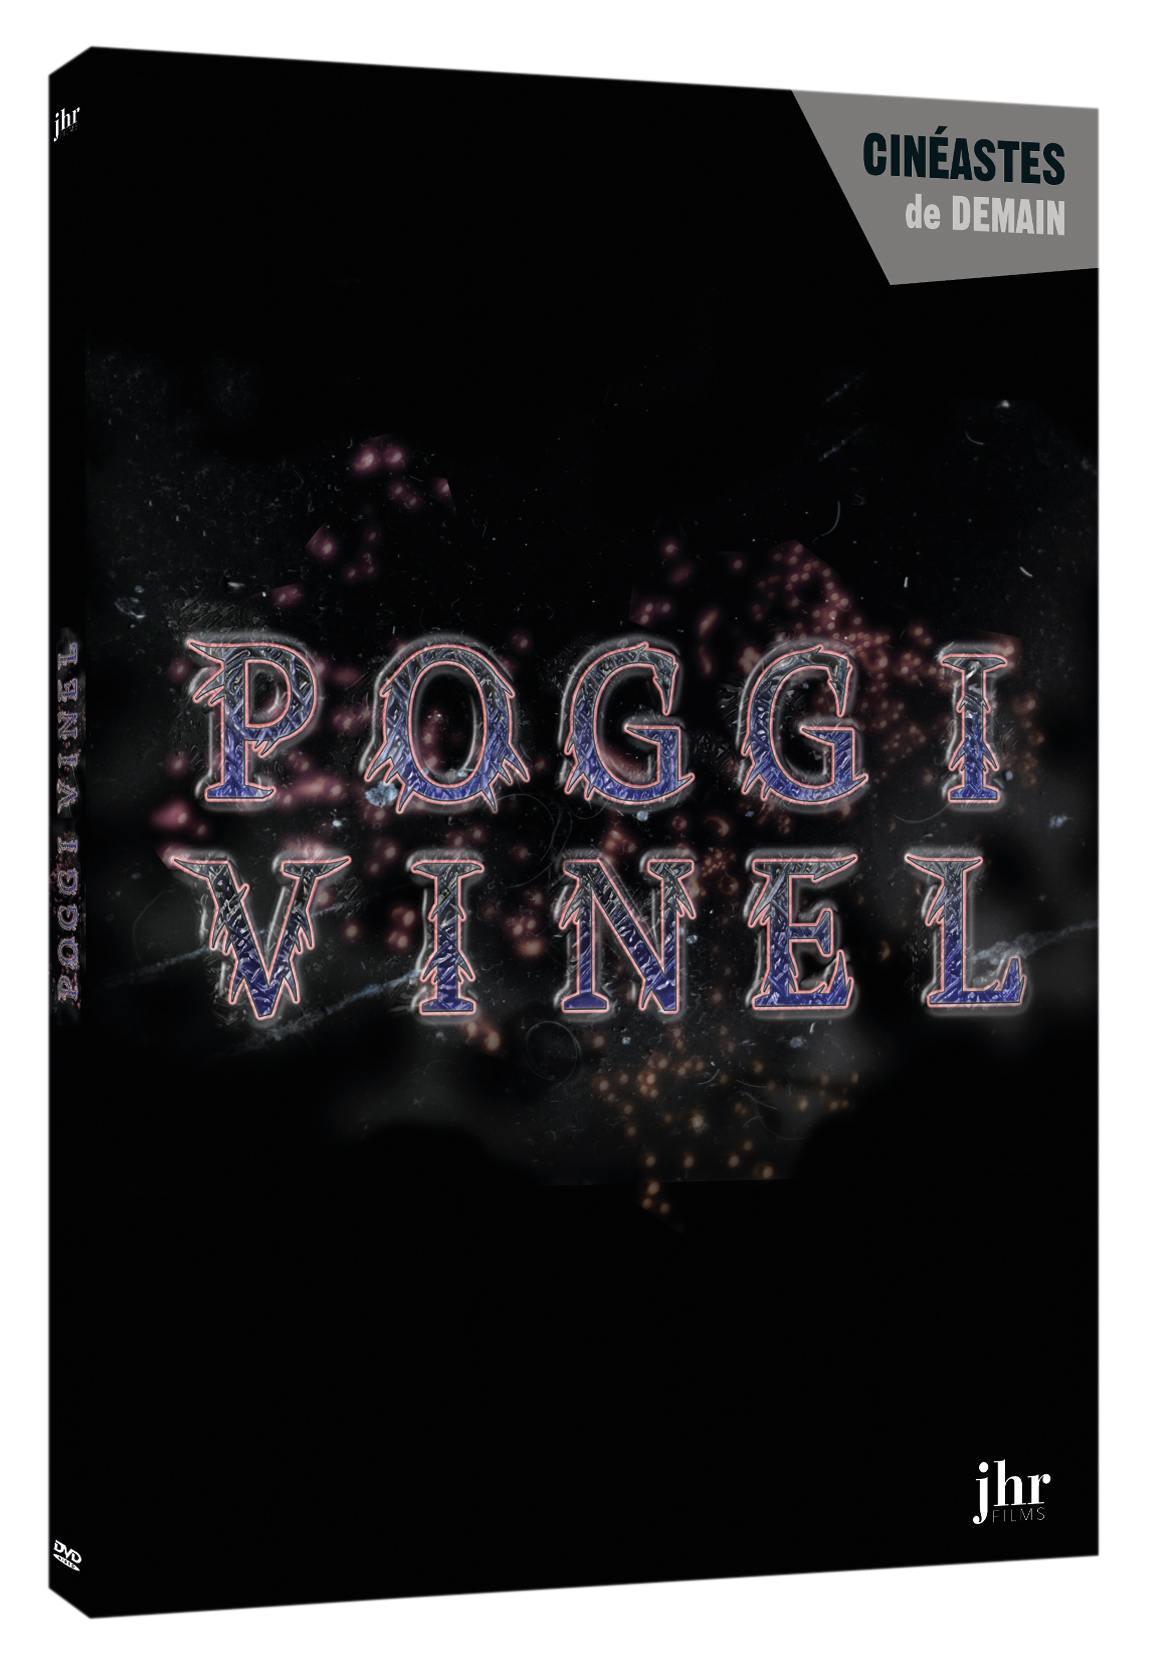 Poggi - vinel - cineastes de demain - dvd